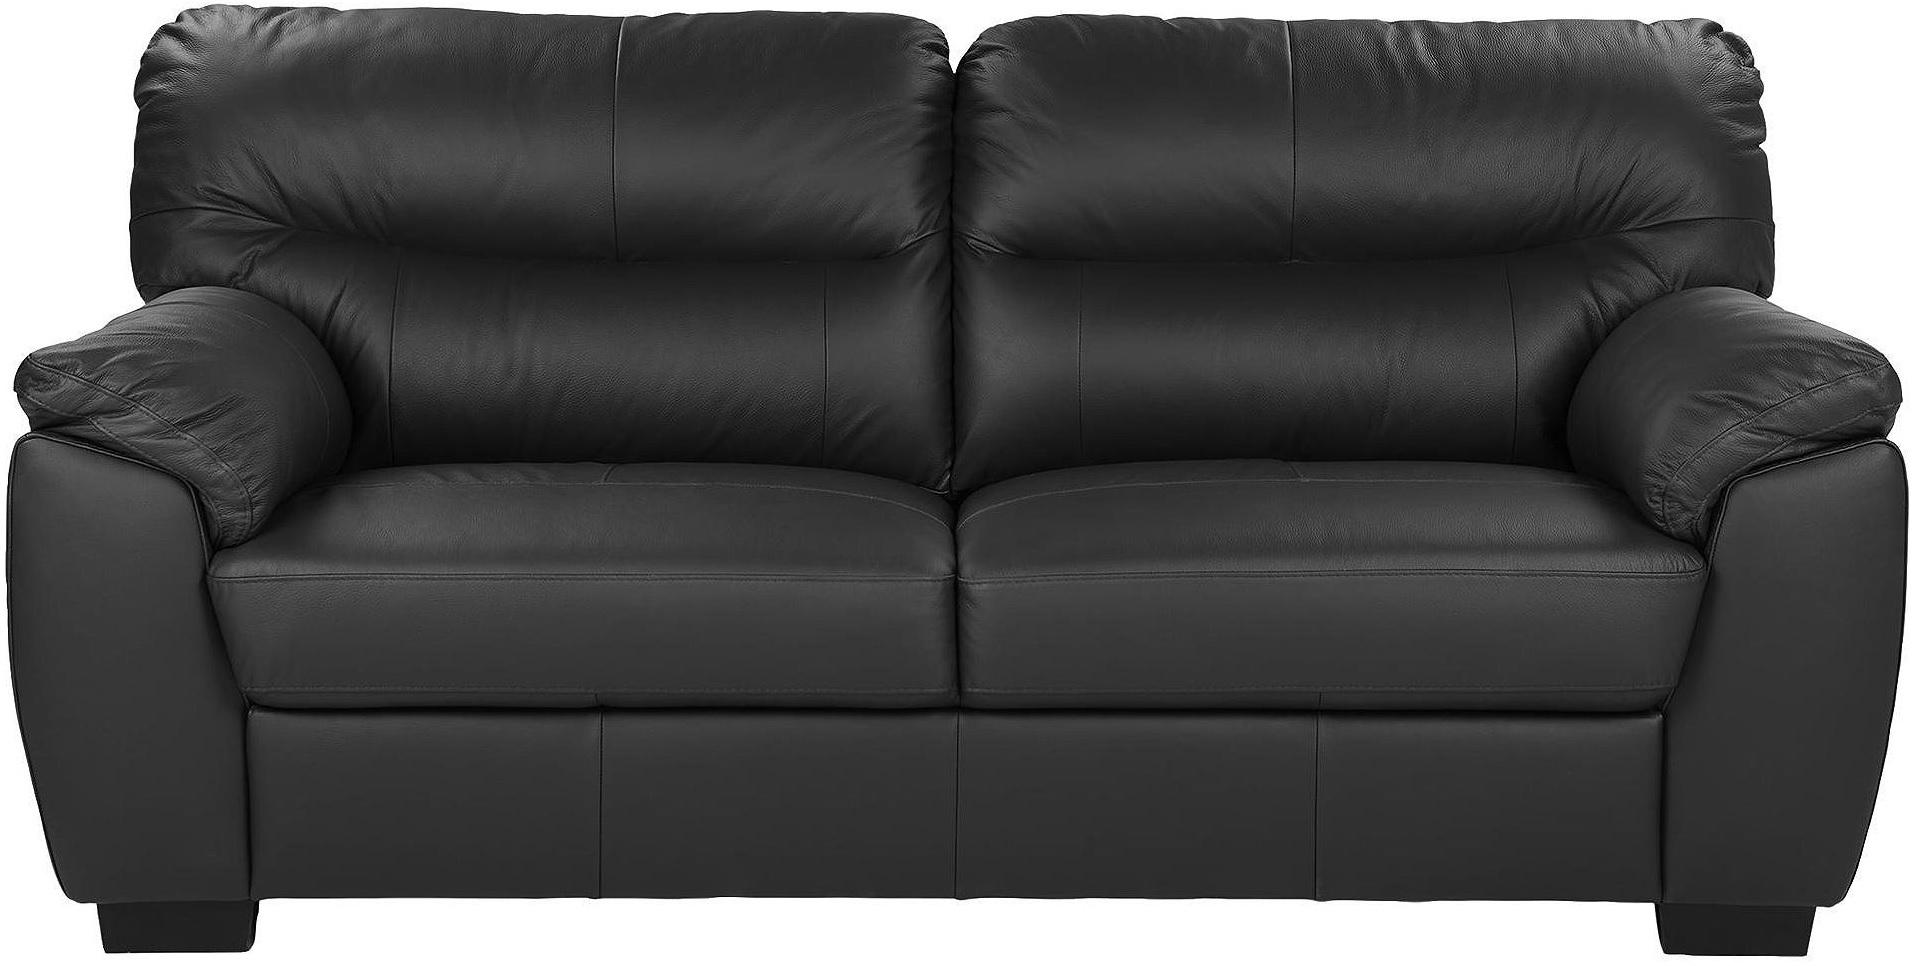 leather sofa black black and white leather sofa black leather